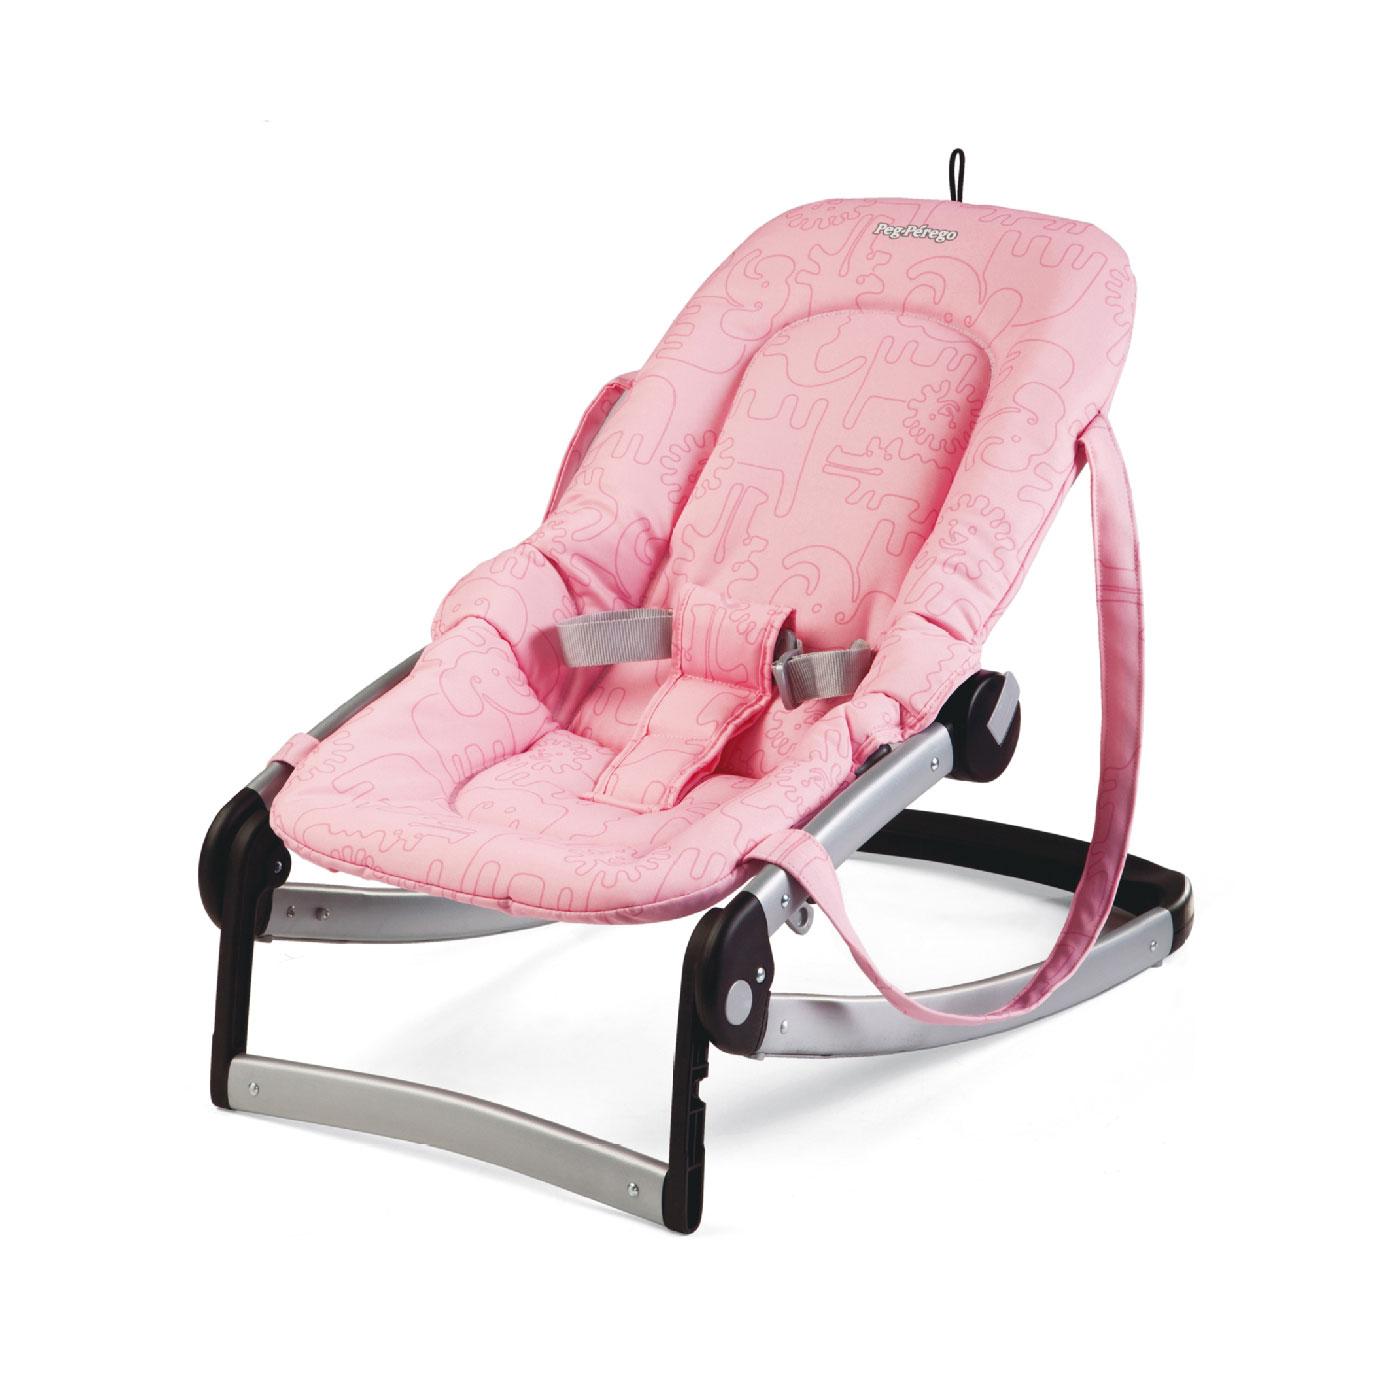 ������� Peg Perego Mia Baby Seat Savana Rosa